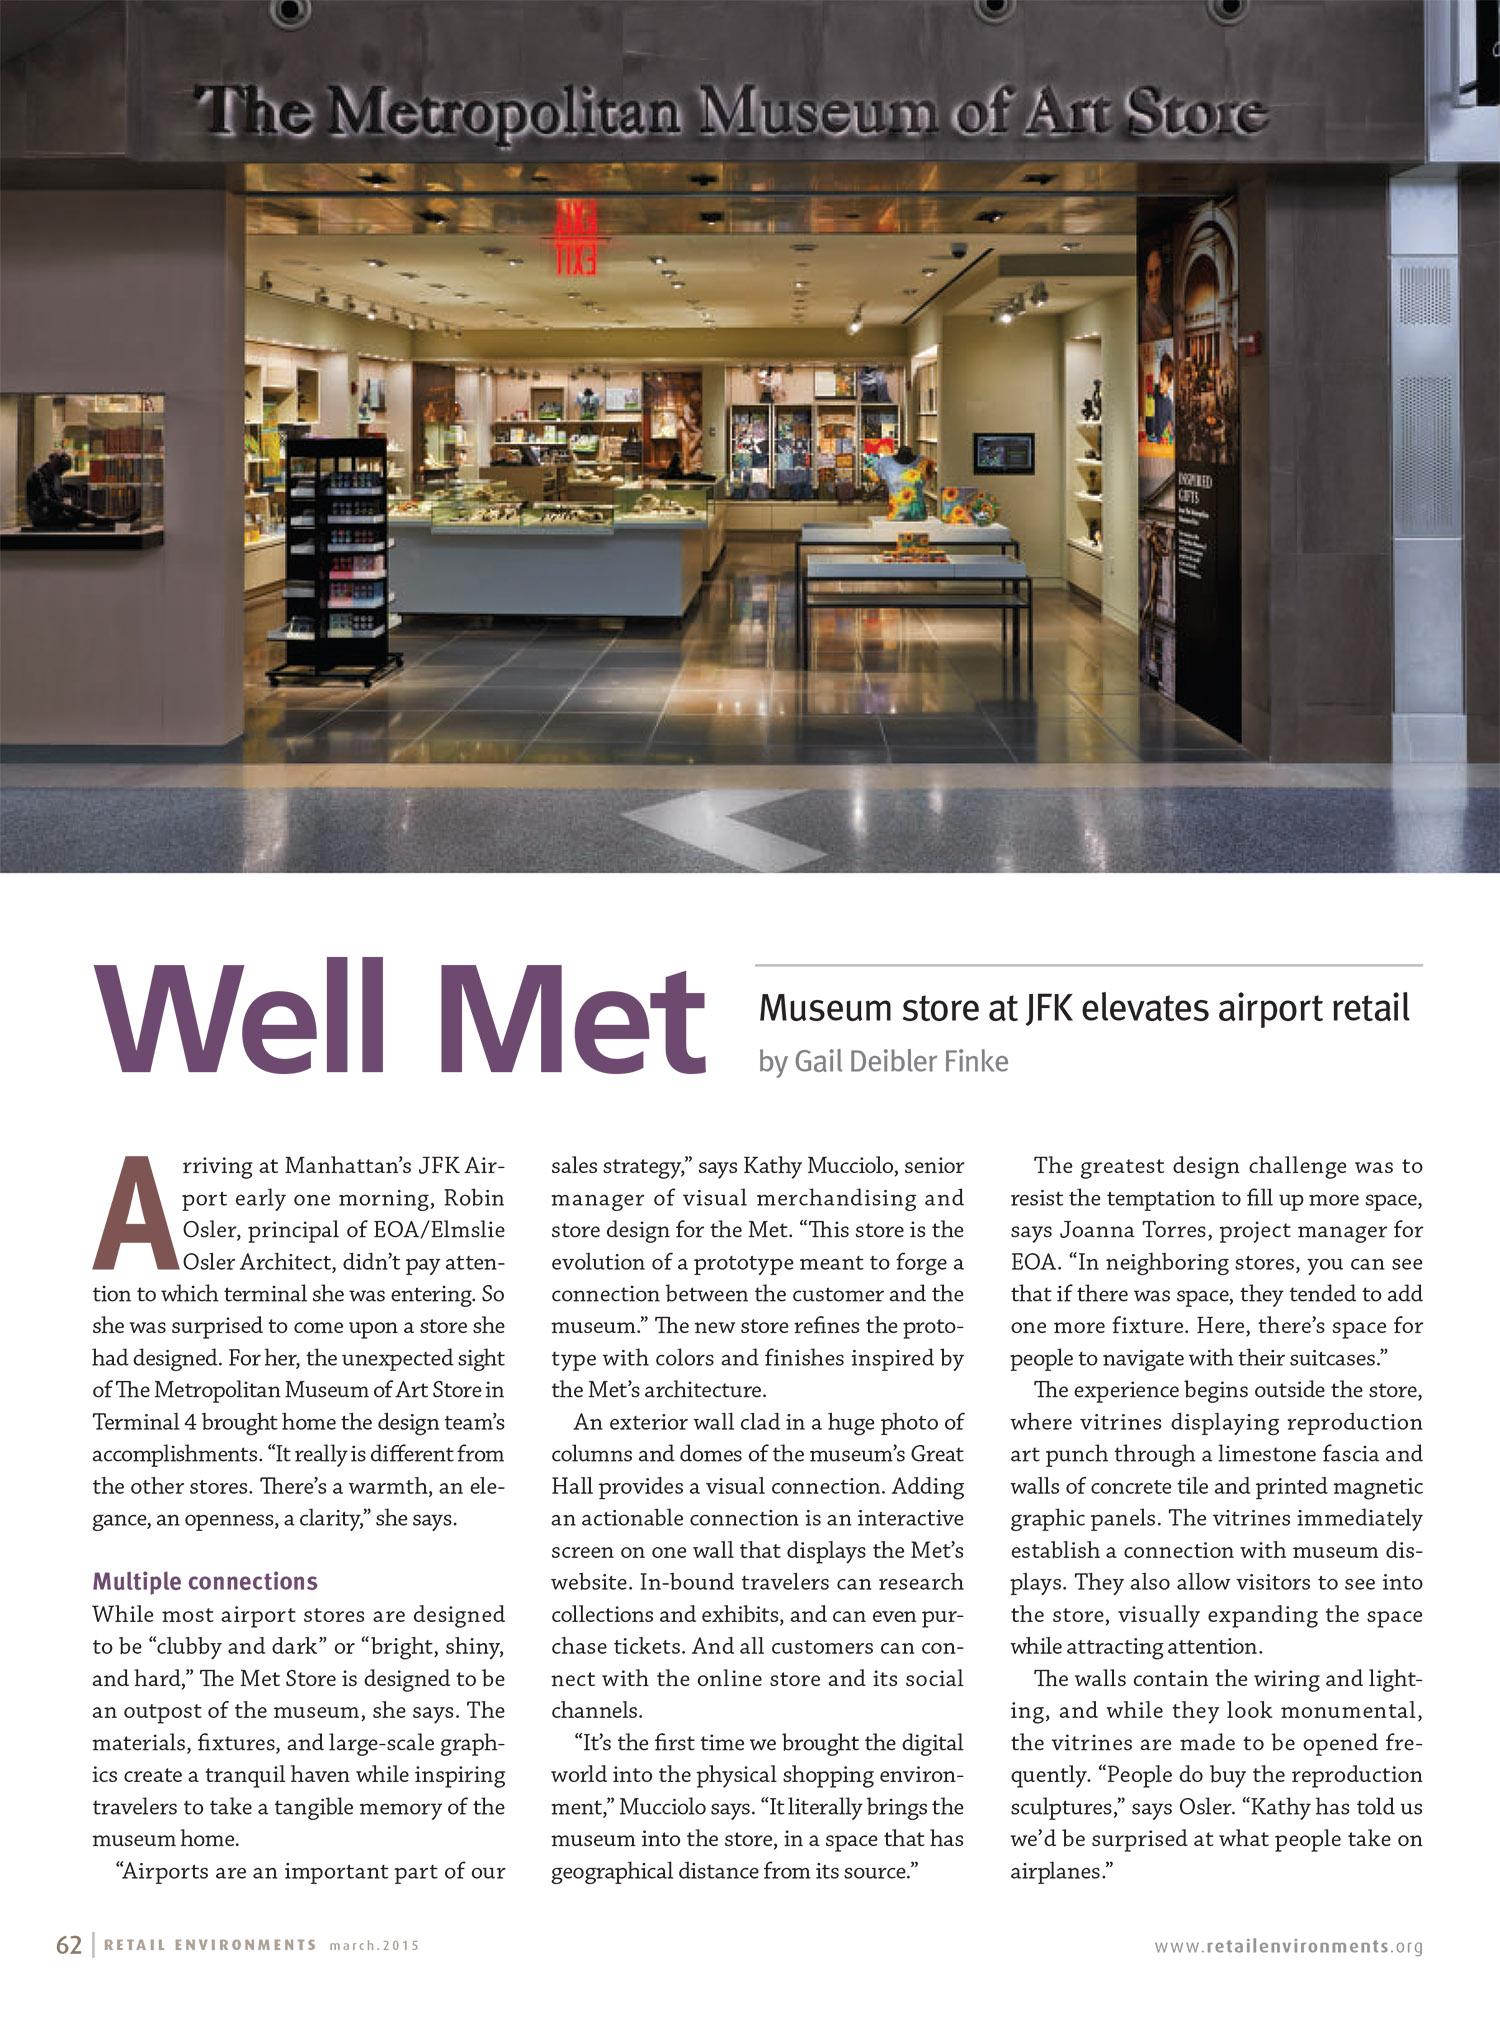 retailenvironments201503-wellmet-2.jpg